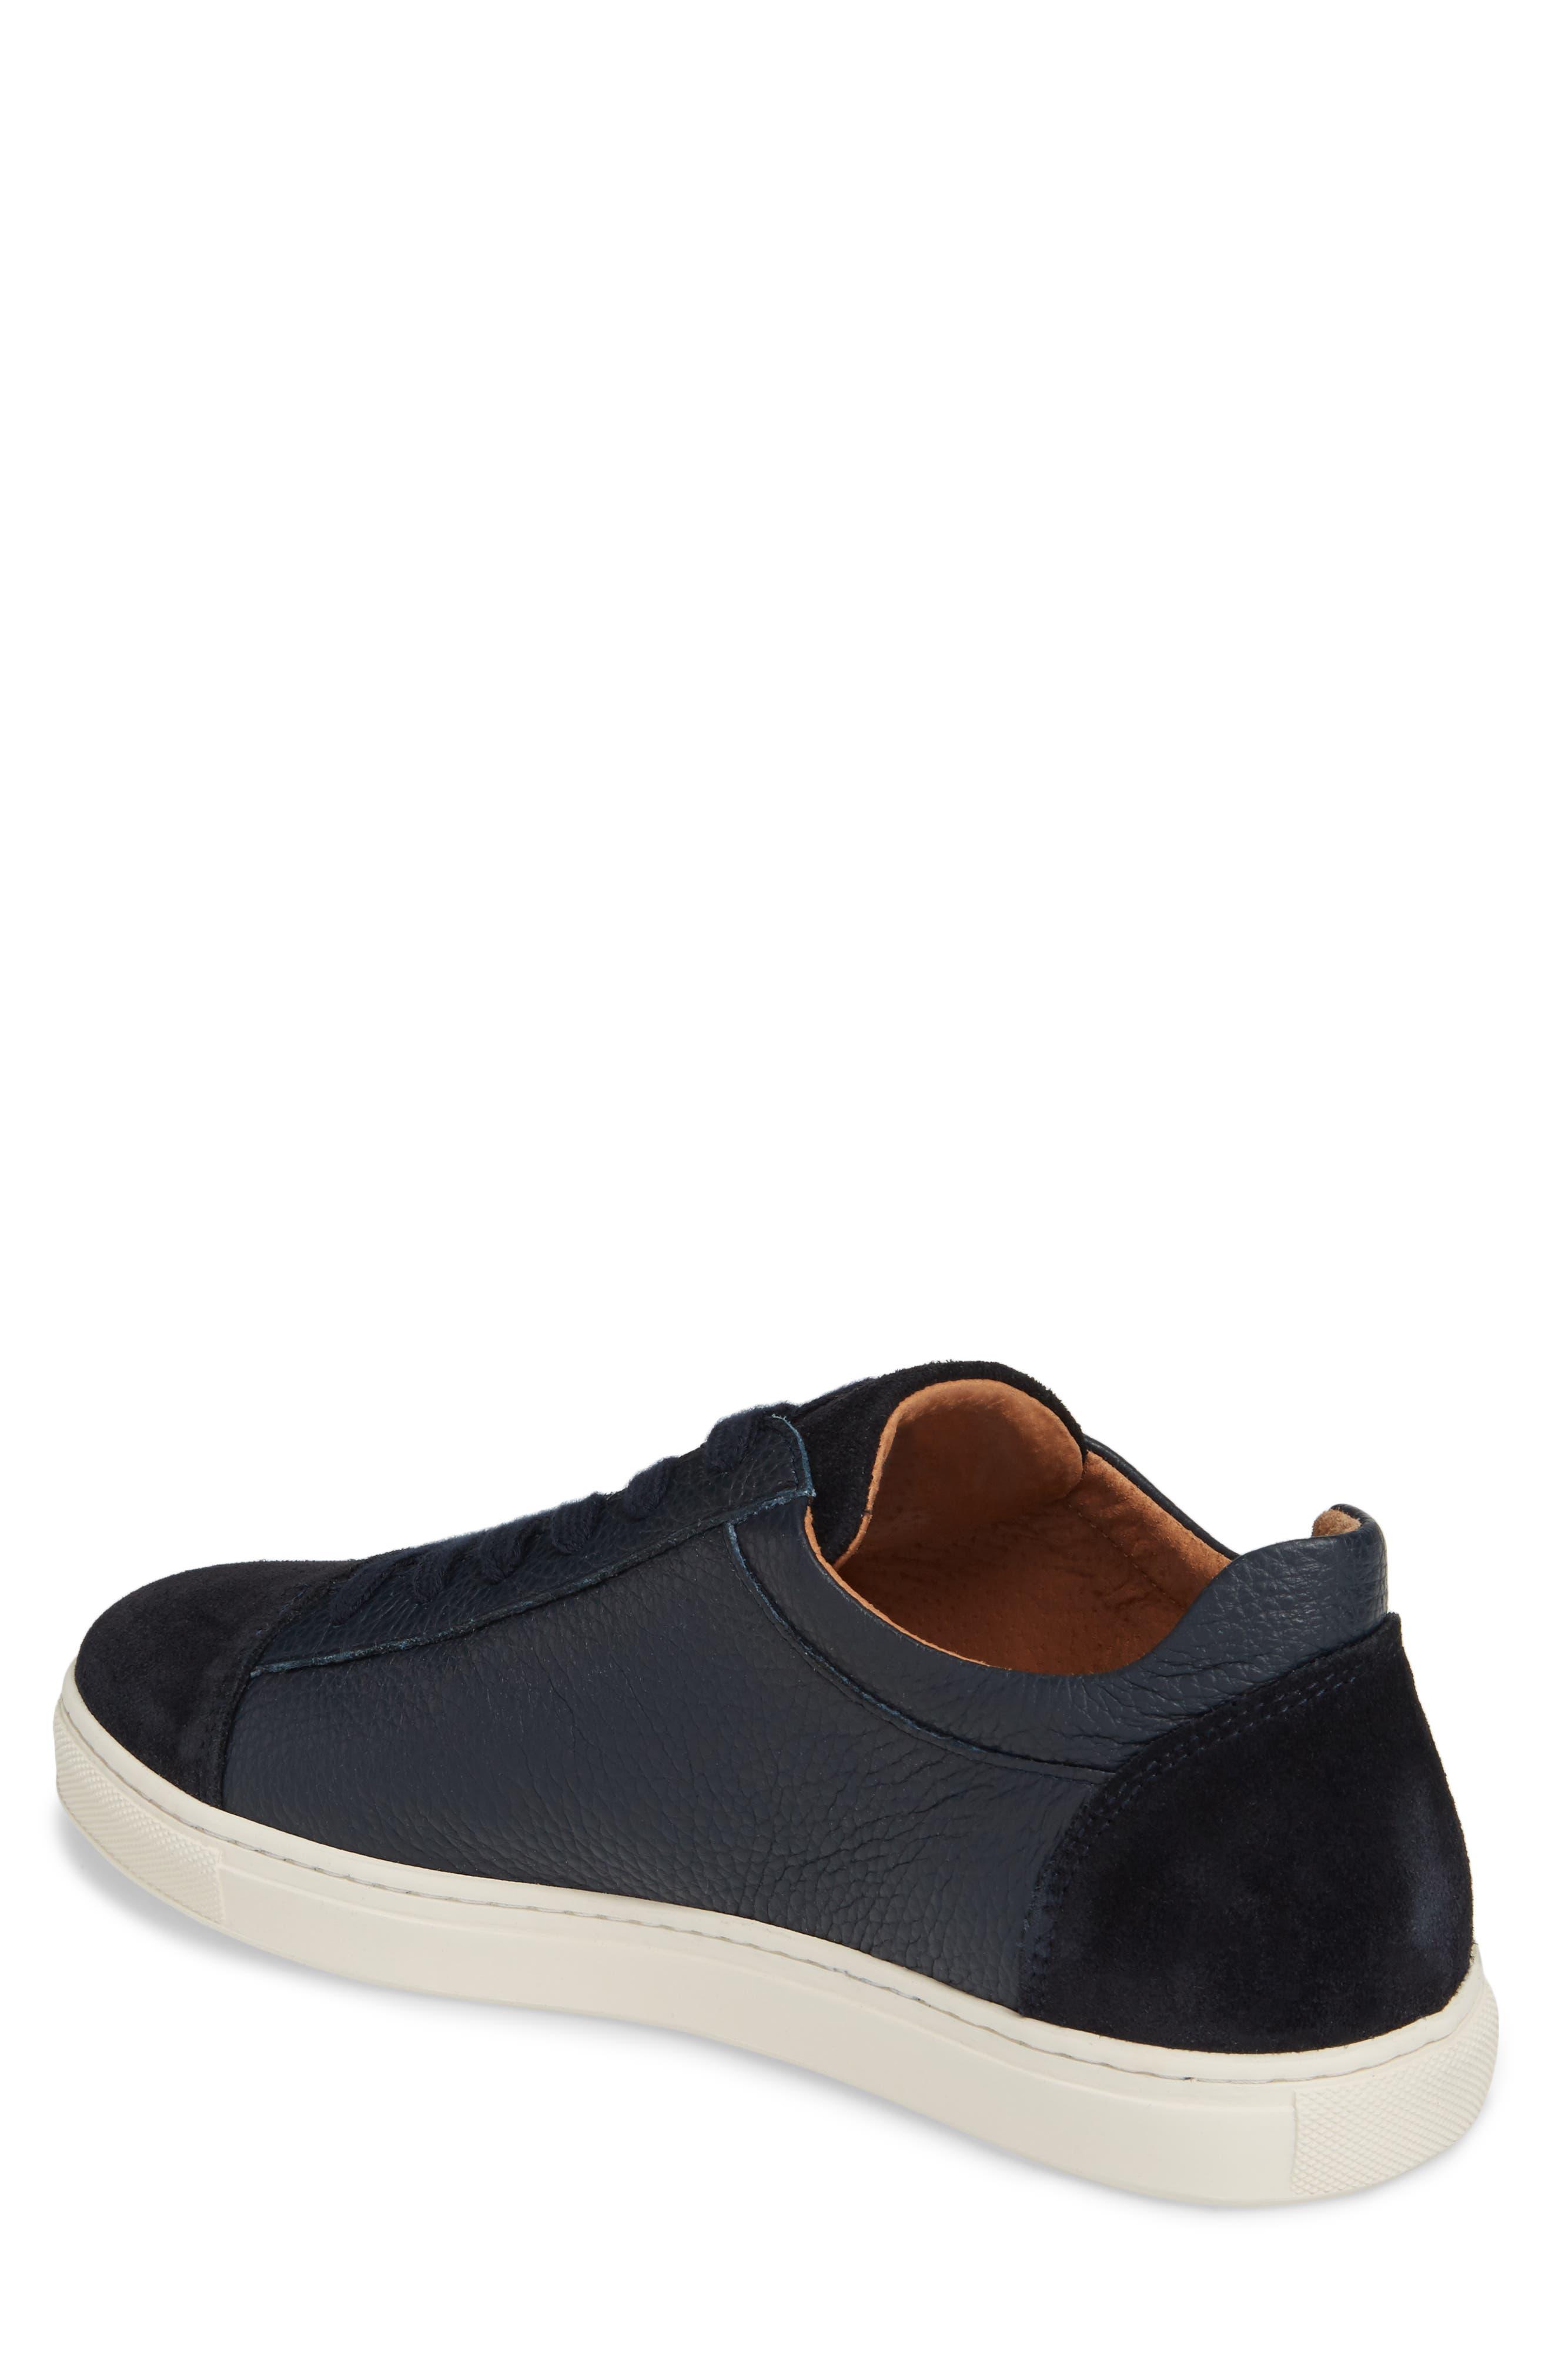 David Cap Toe Sneaker,                             Alternate thumbnail 2, color,                             Dark Navy Leather/ Suede